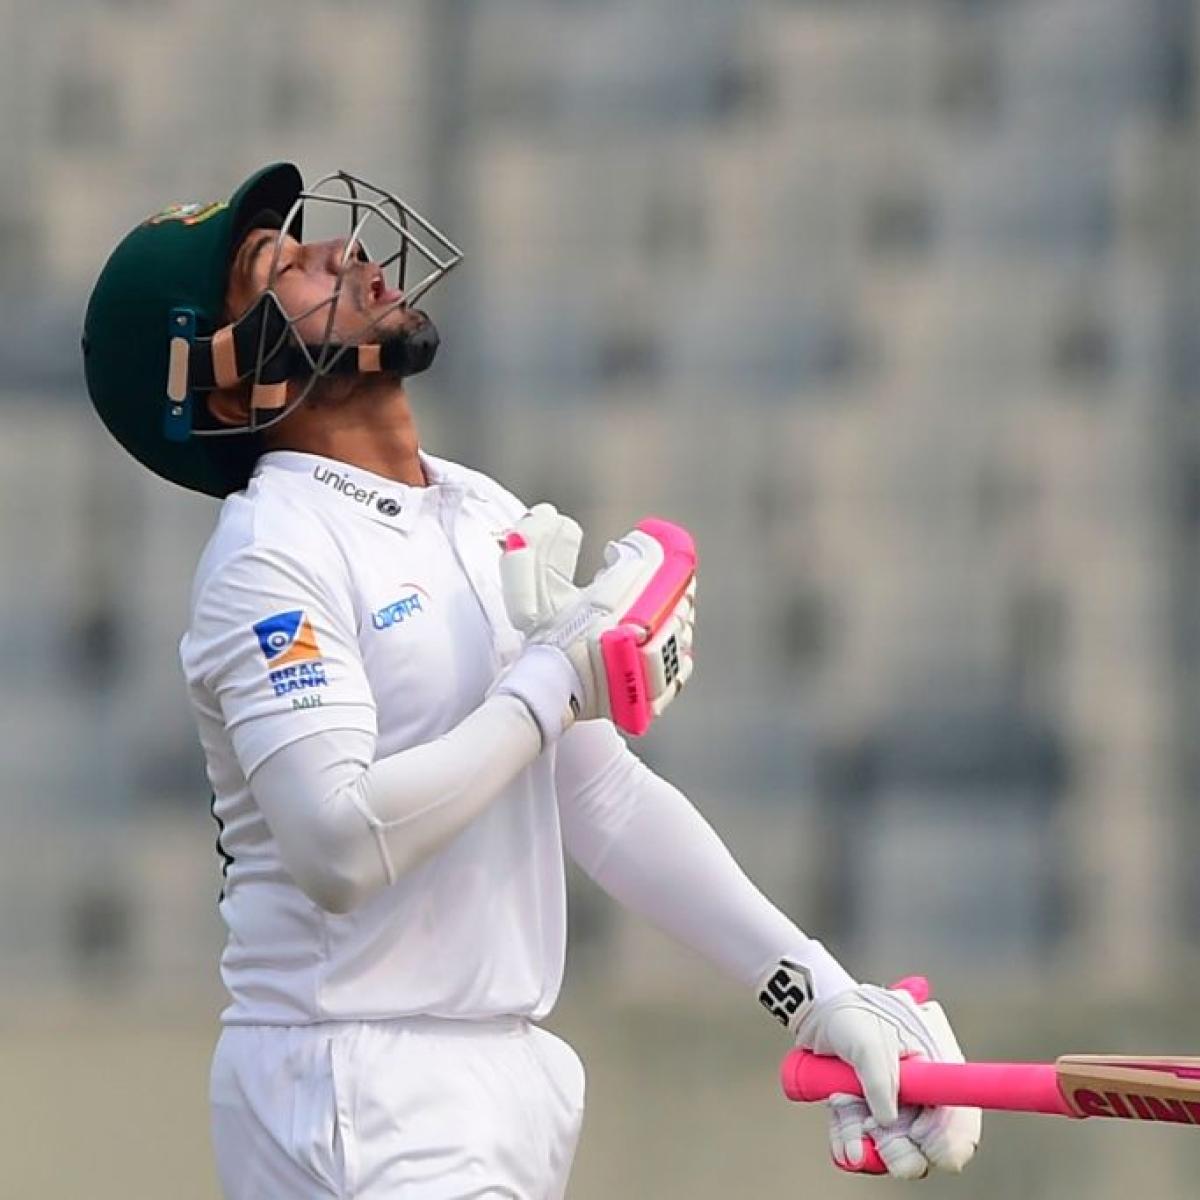 BAN vs ZIM: Mushfiqur Rahim's double century makes him Bangladesh's leading run-scorer in Tests